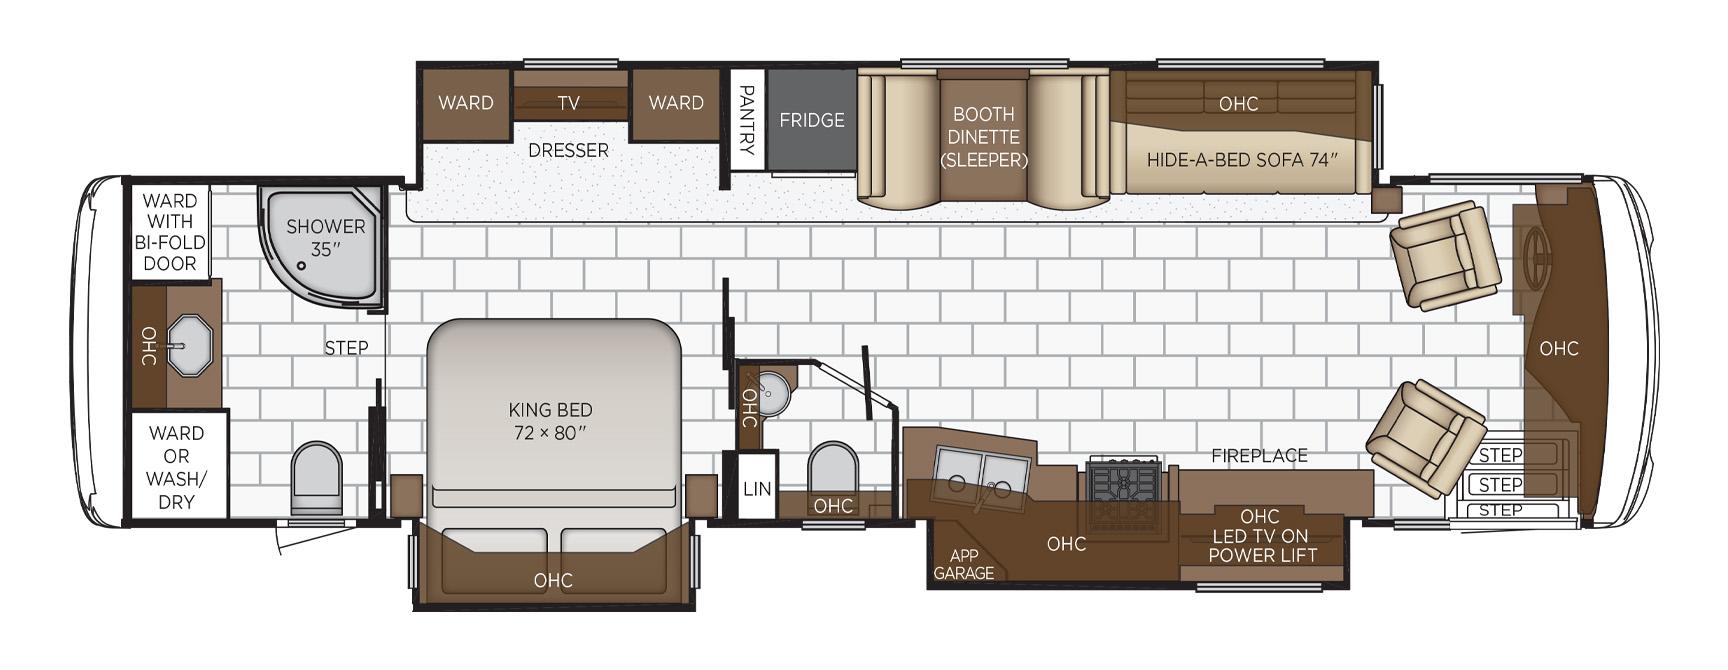 2022 Ventana Floor Plan Options Newmar